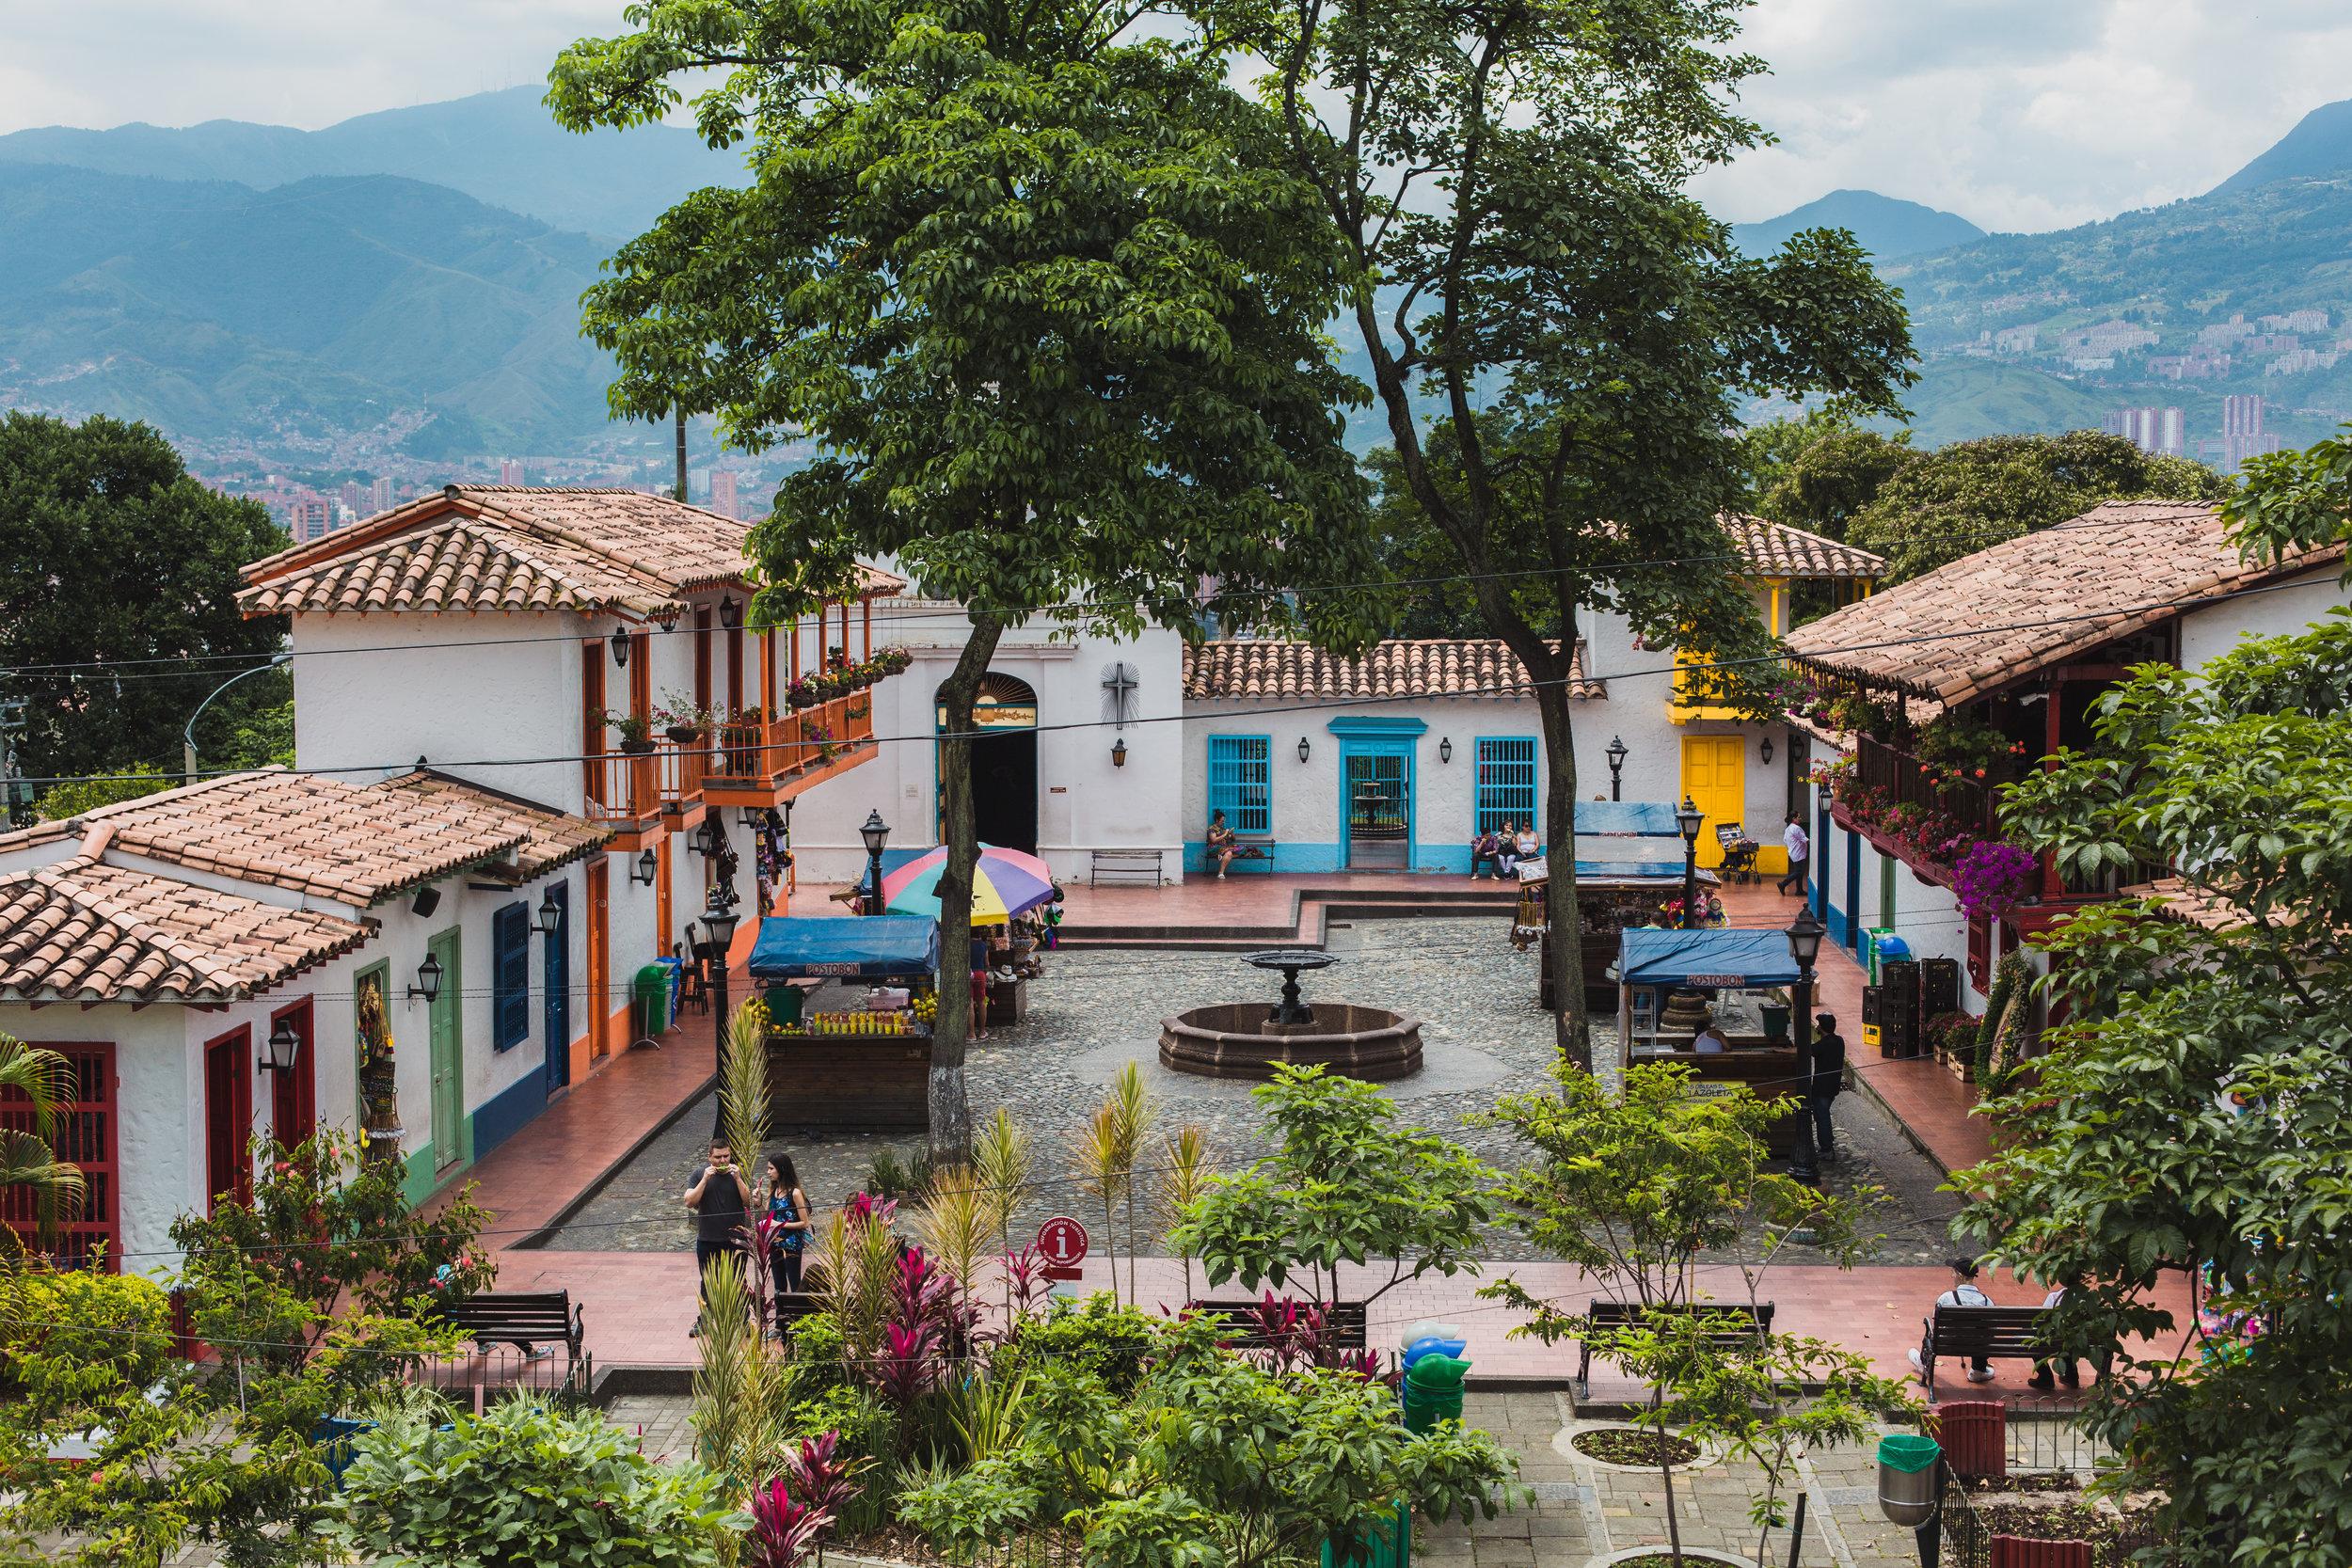 Colombia_Medellin_2017_1-3.JPG